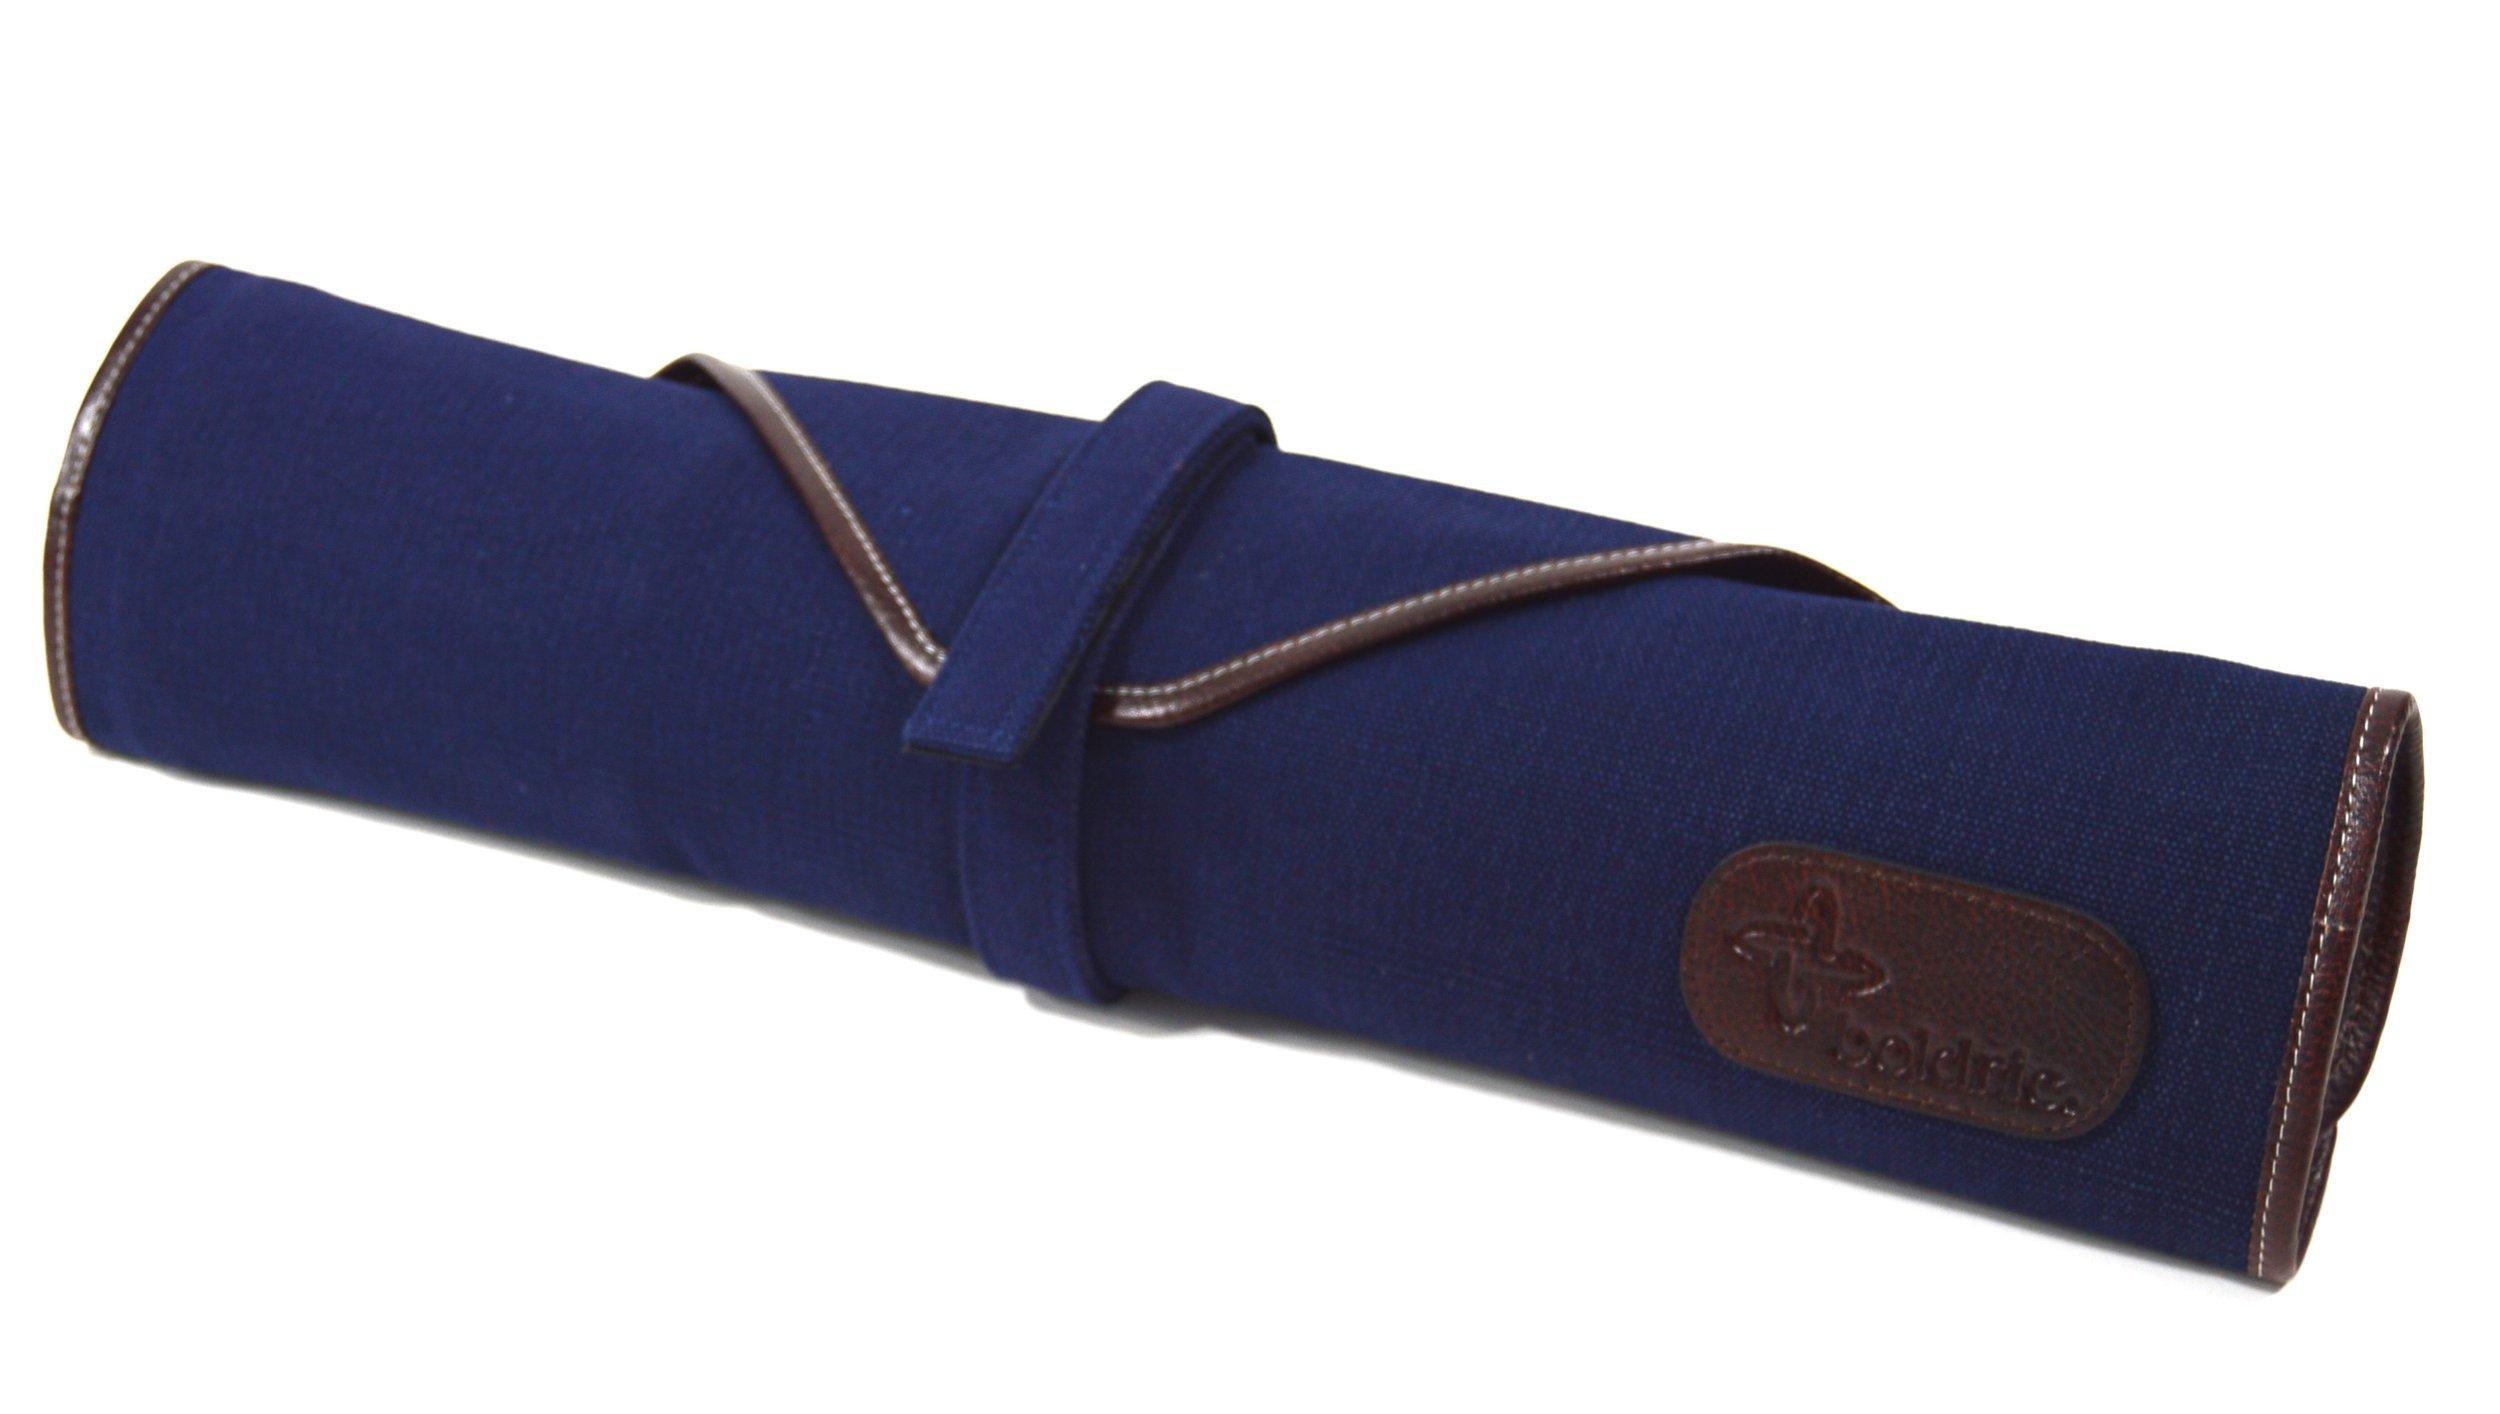 Boldric 6 Pocket Canvas Knife Bag, Heavy-Duty Portable Chef's Knives Case, Navy, 20-inch